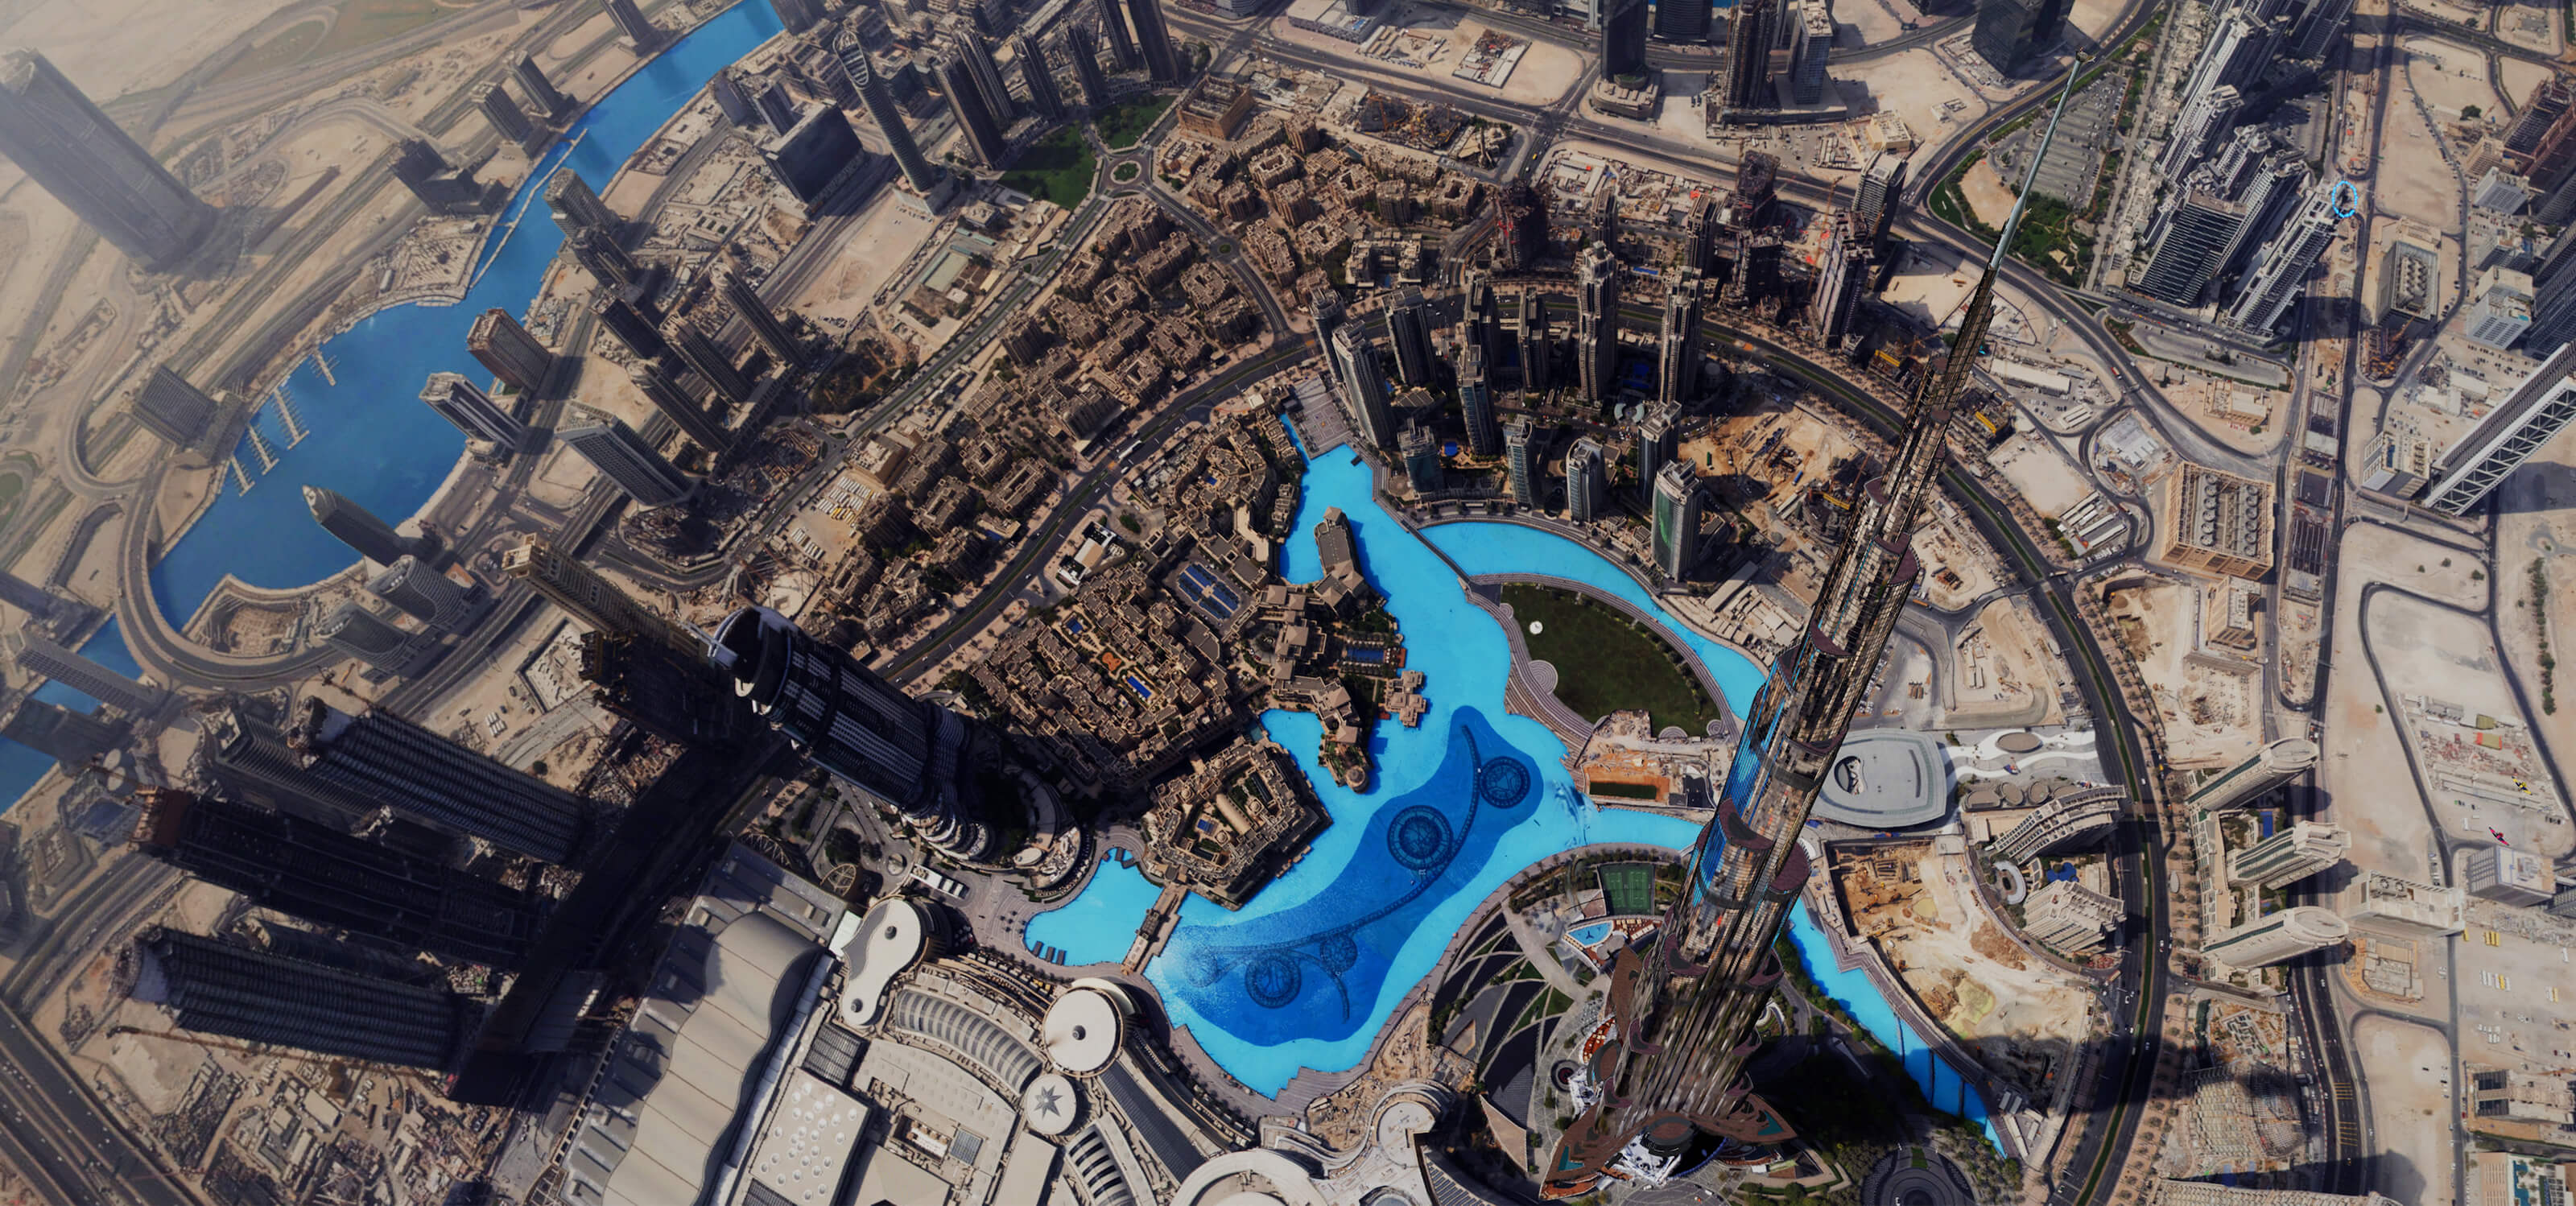 The Dubai landscape from a birds-eye view, taken from the VR title Dubai Rising Falcon.